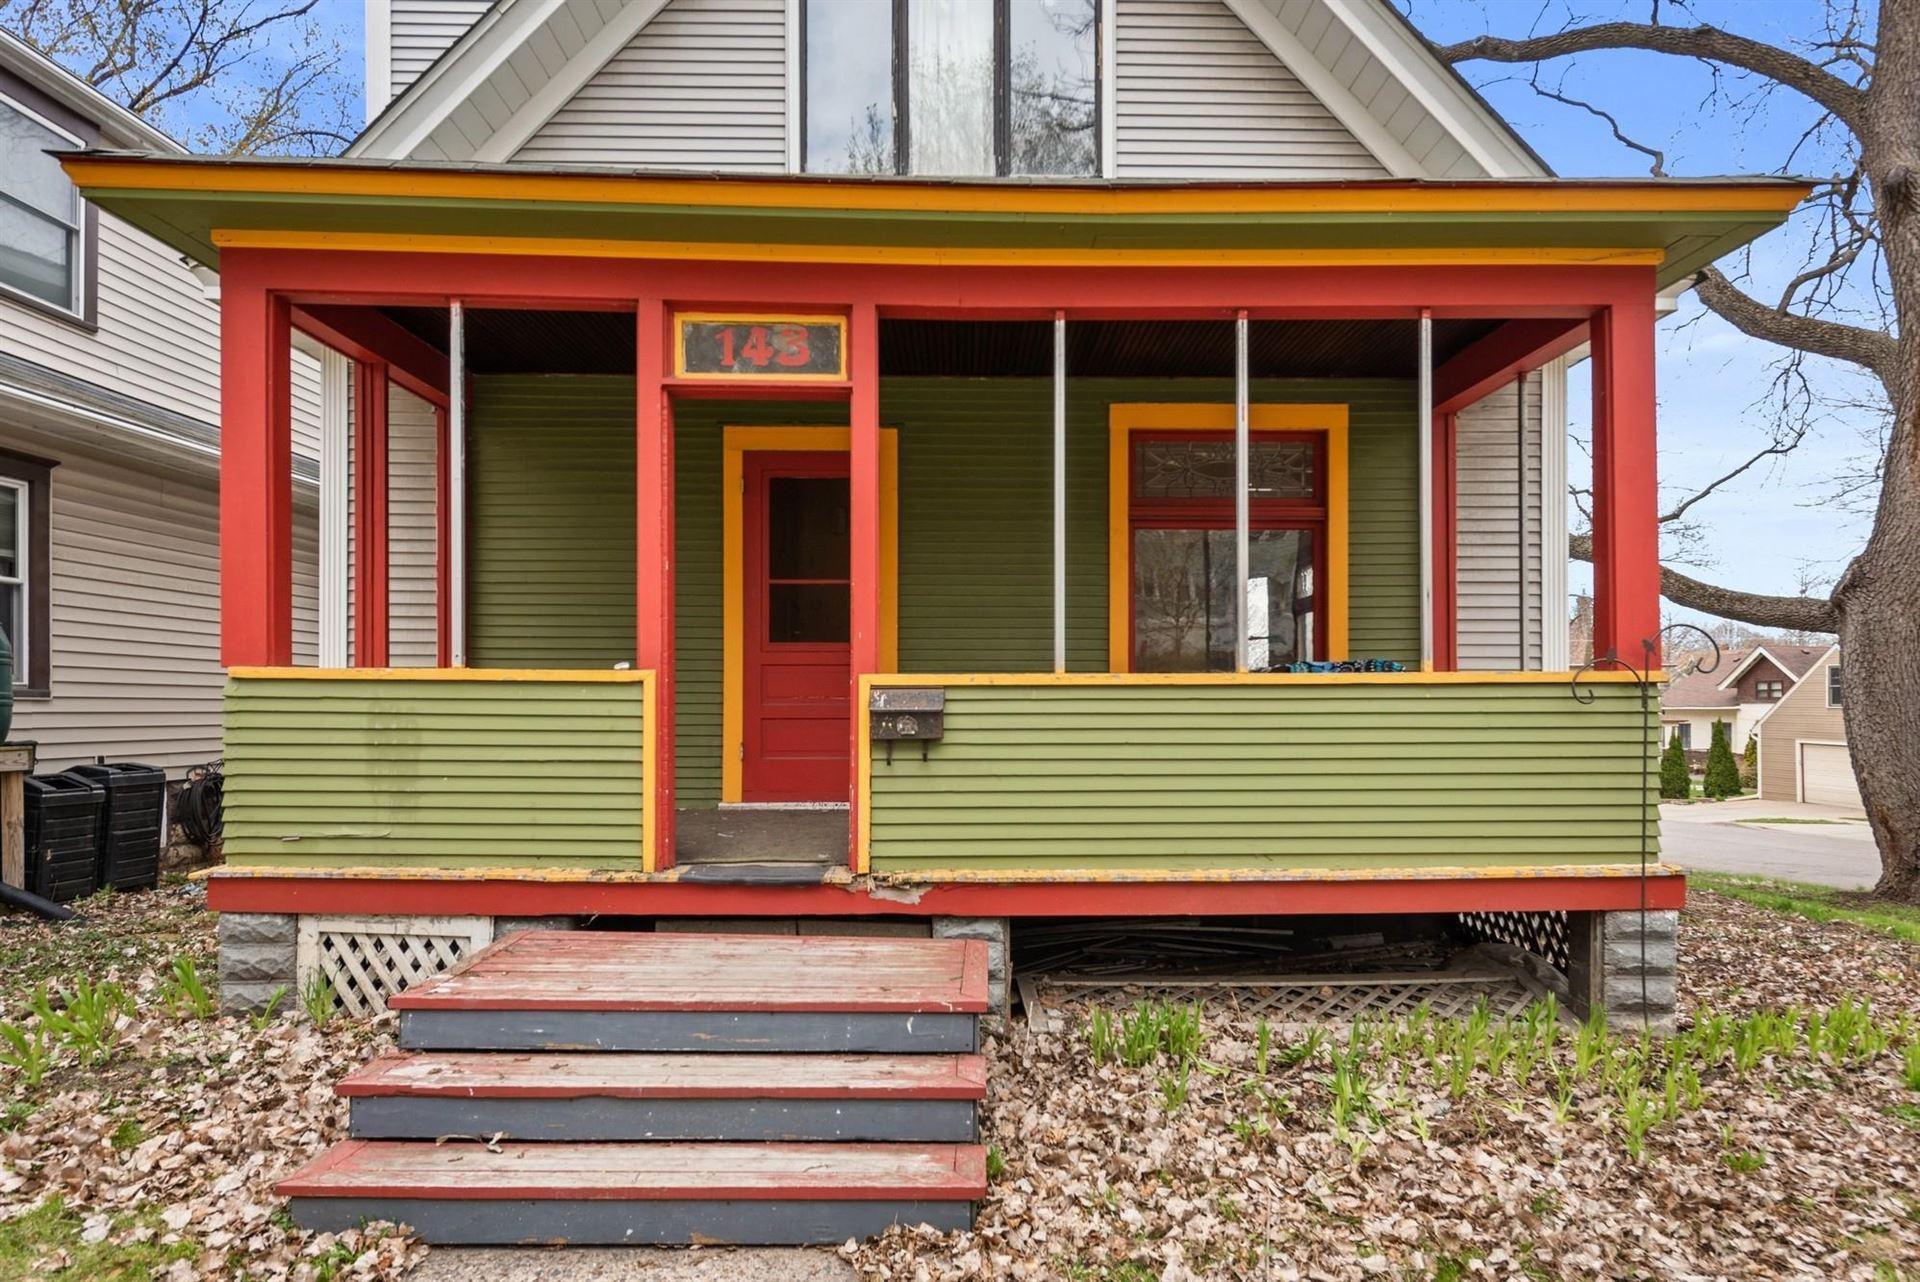 Photo of 143 Bates Avenue, Saint Paul, MN 55106 (MLS # 5737495)